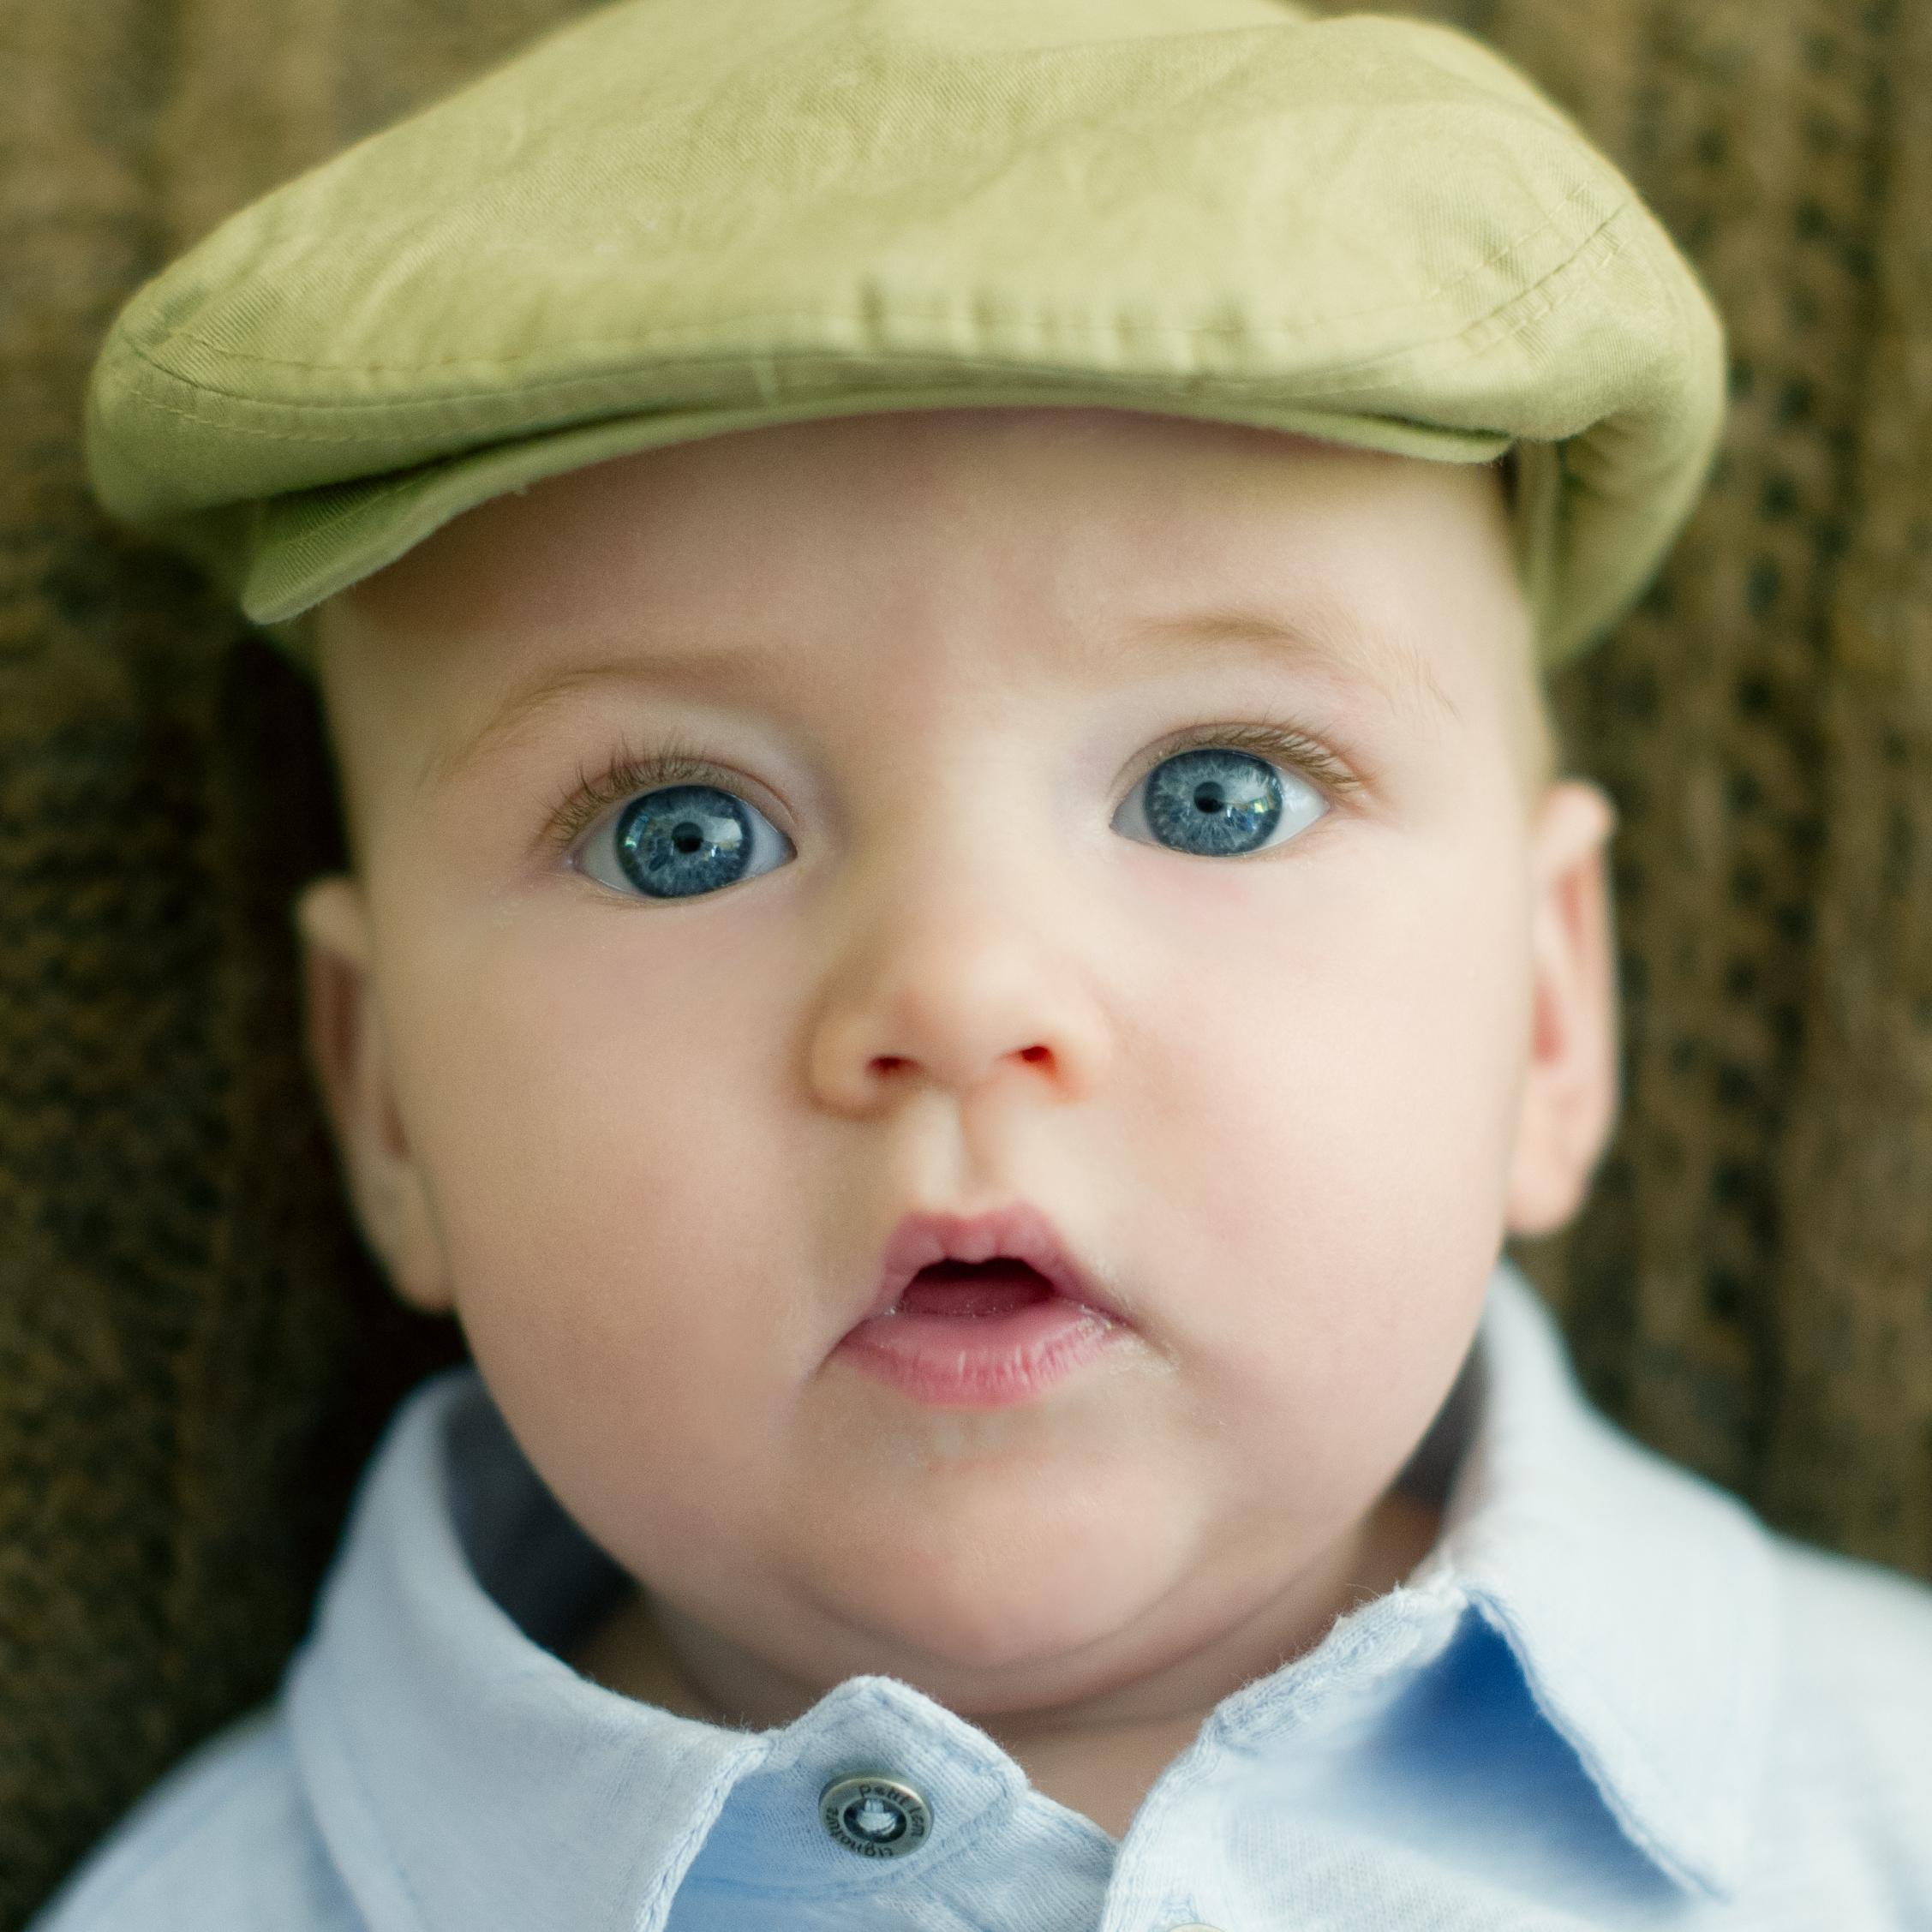 seattle-children-photographer-5.jpg